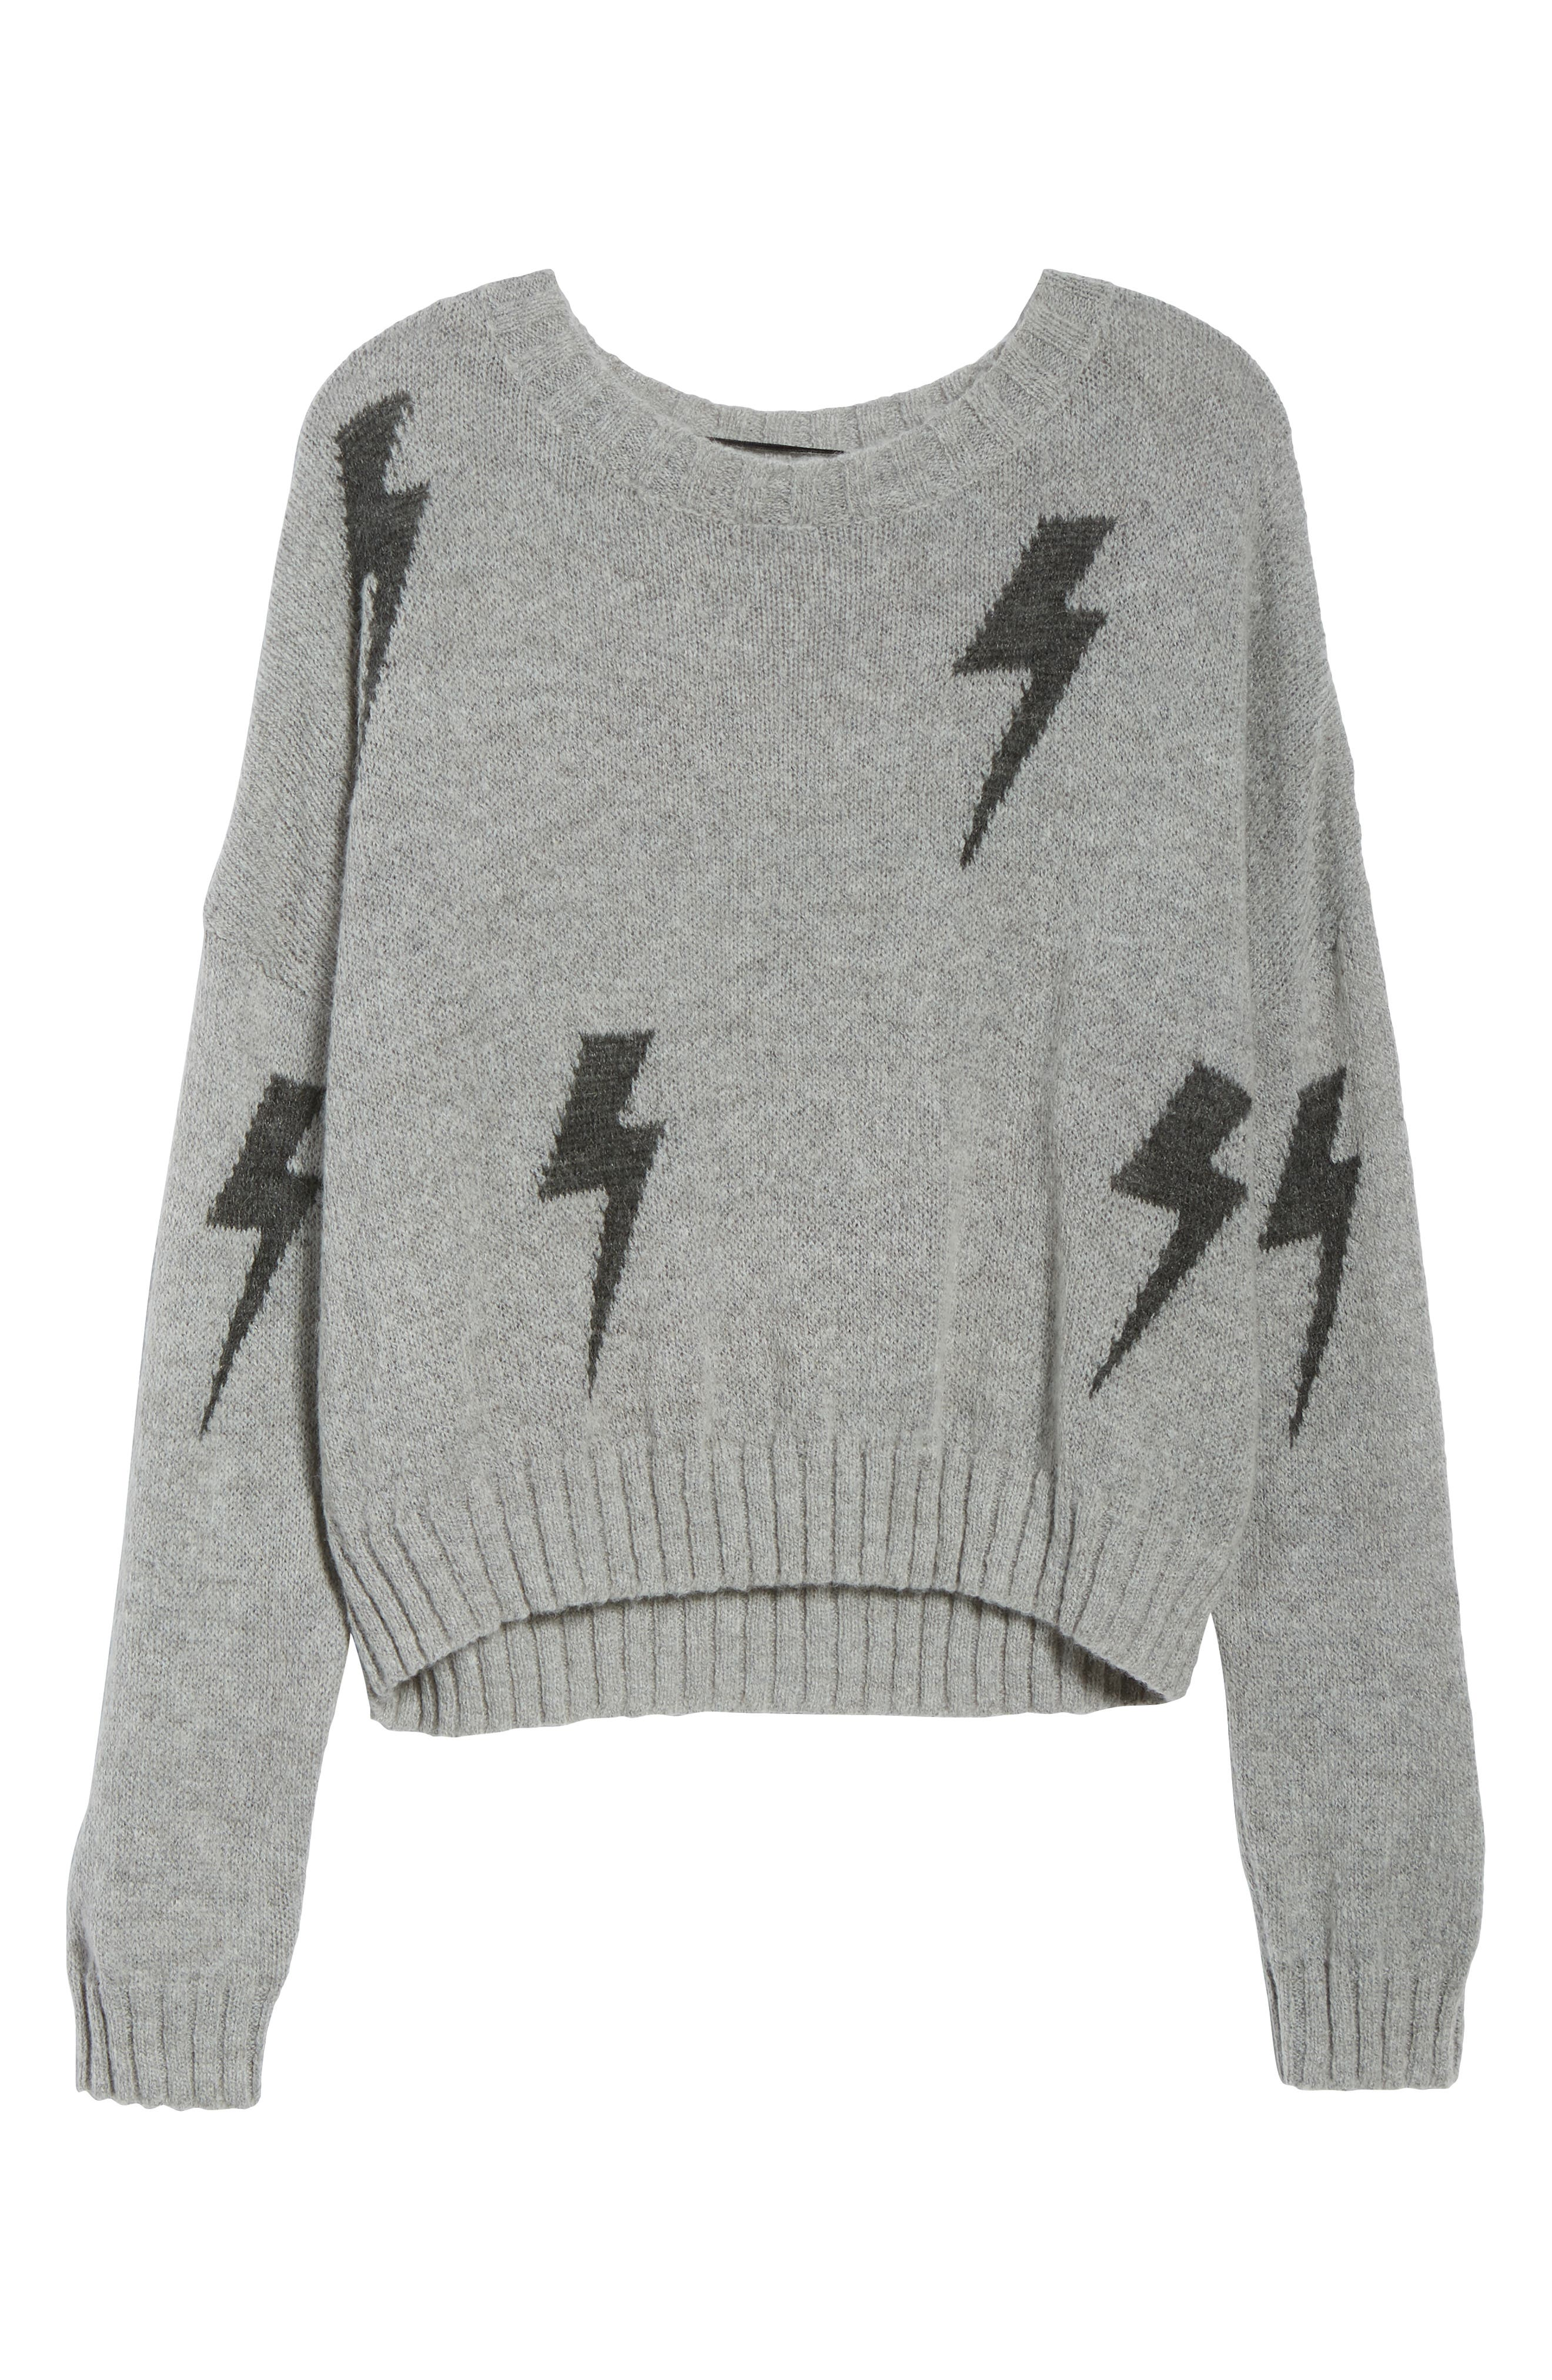 Perci Sweater,                             Alternate thumbnail 7, color,                             GREY/CHARCOAL LIGHTNING